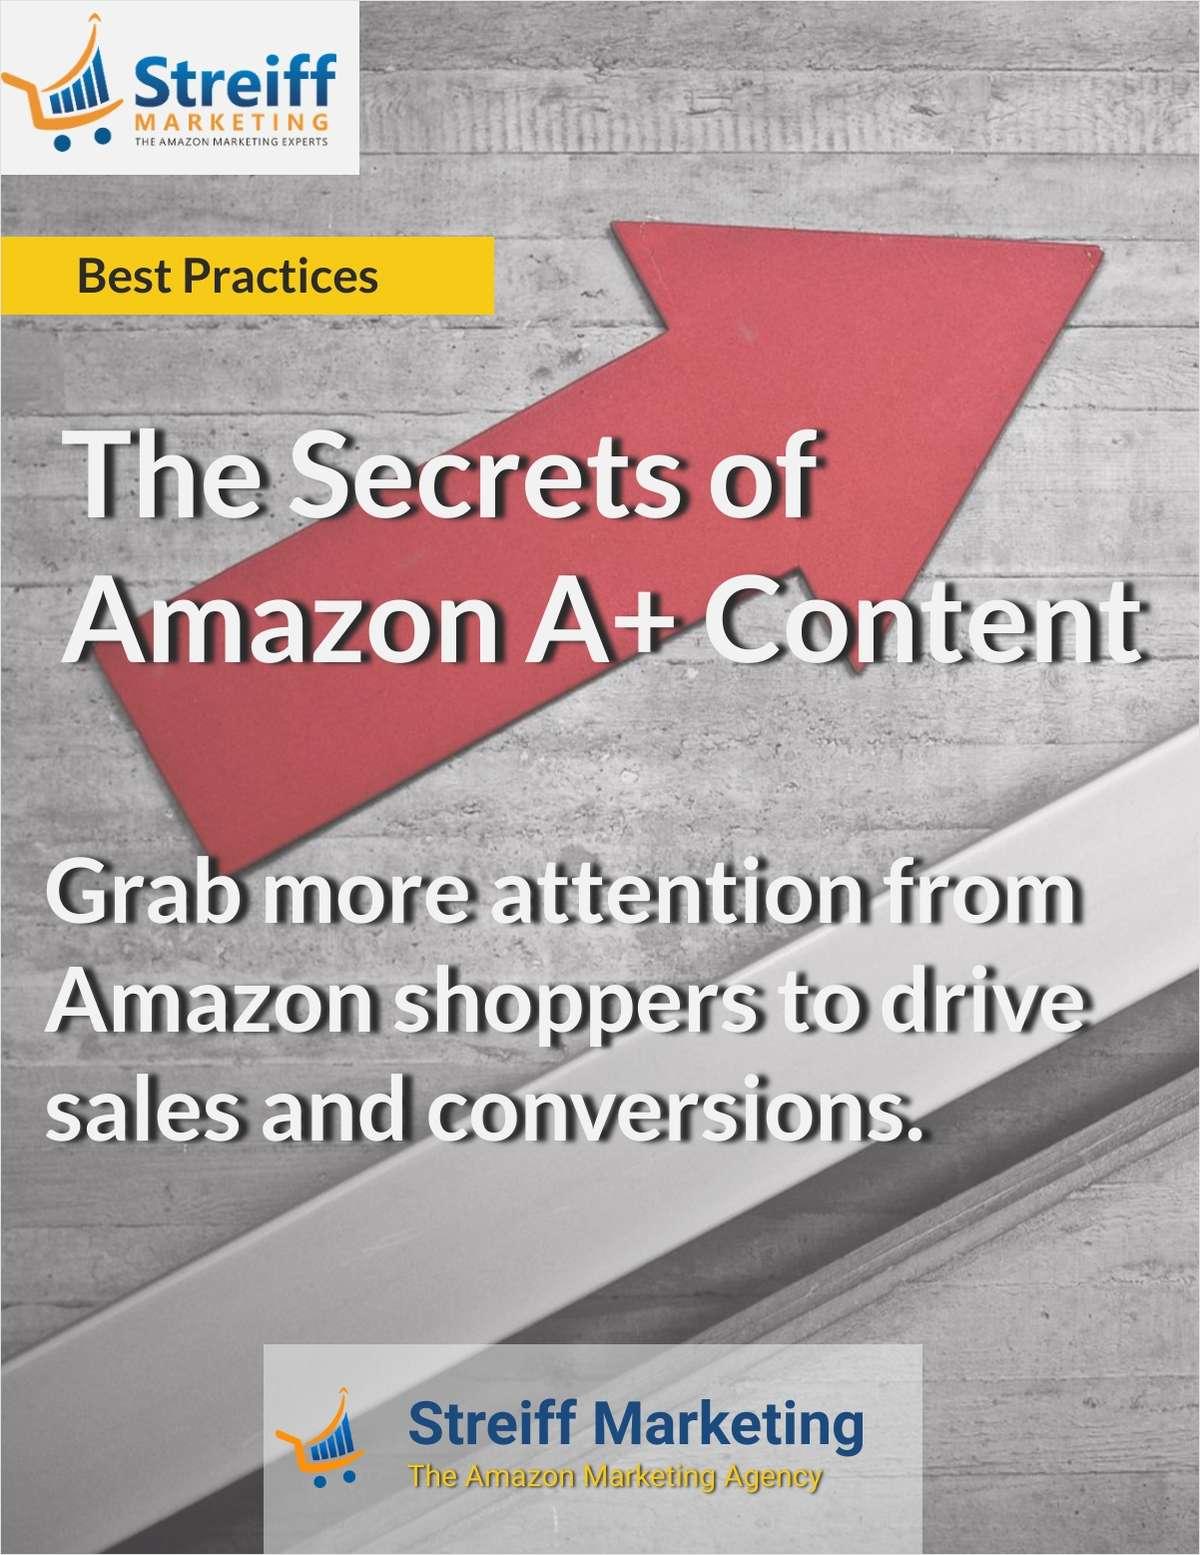 The Secrets of Amazon A+ Content